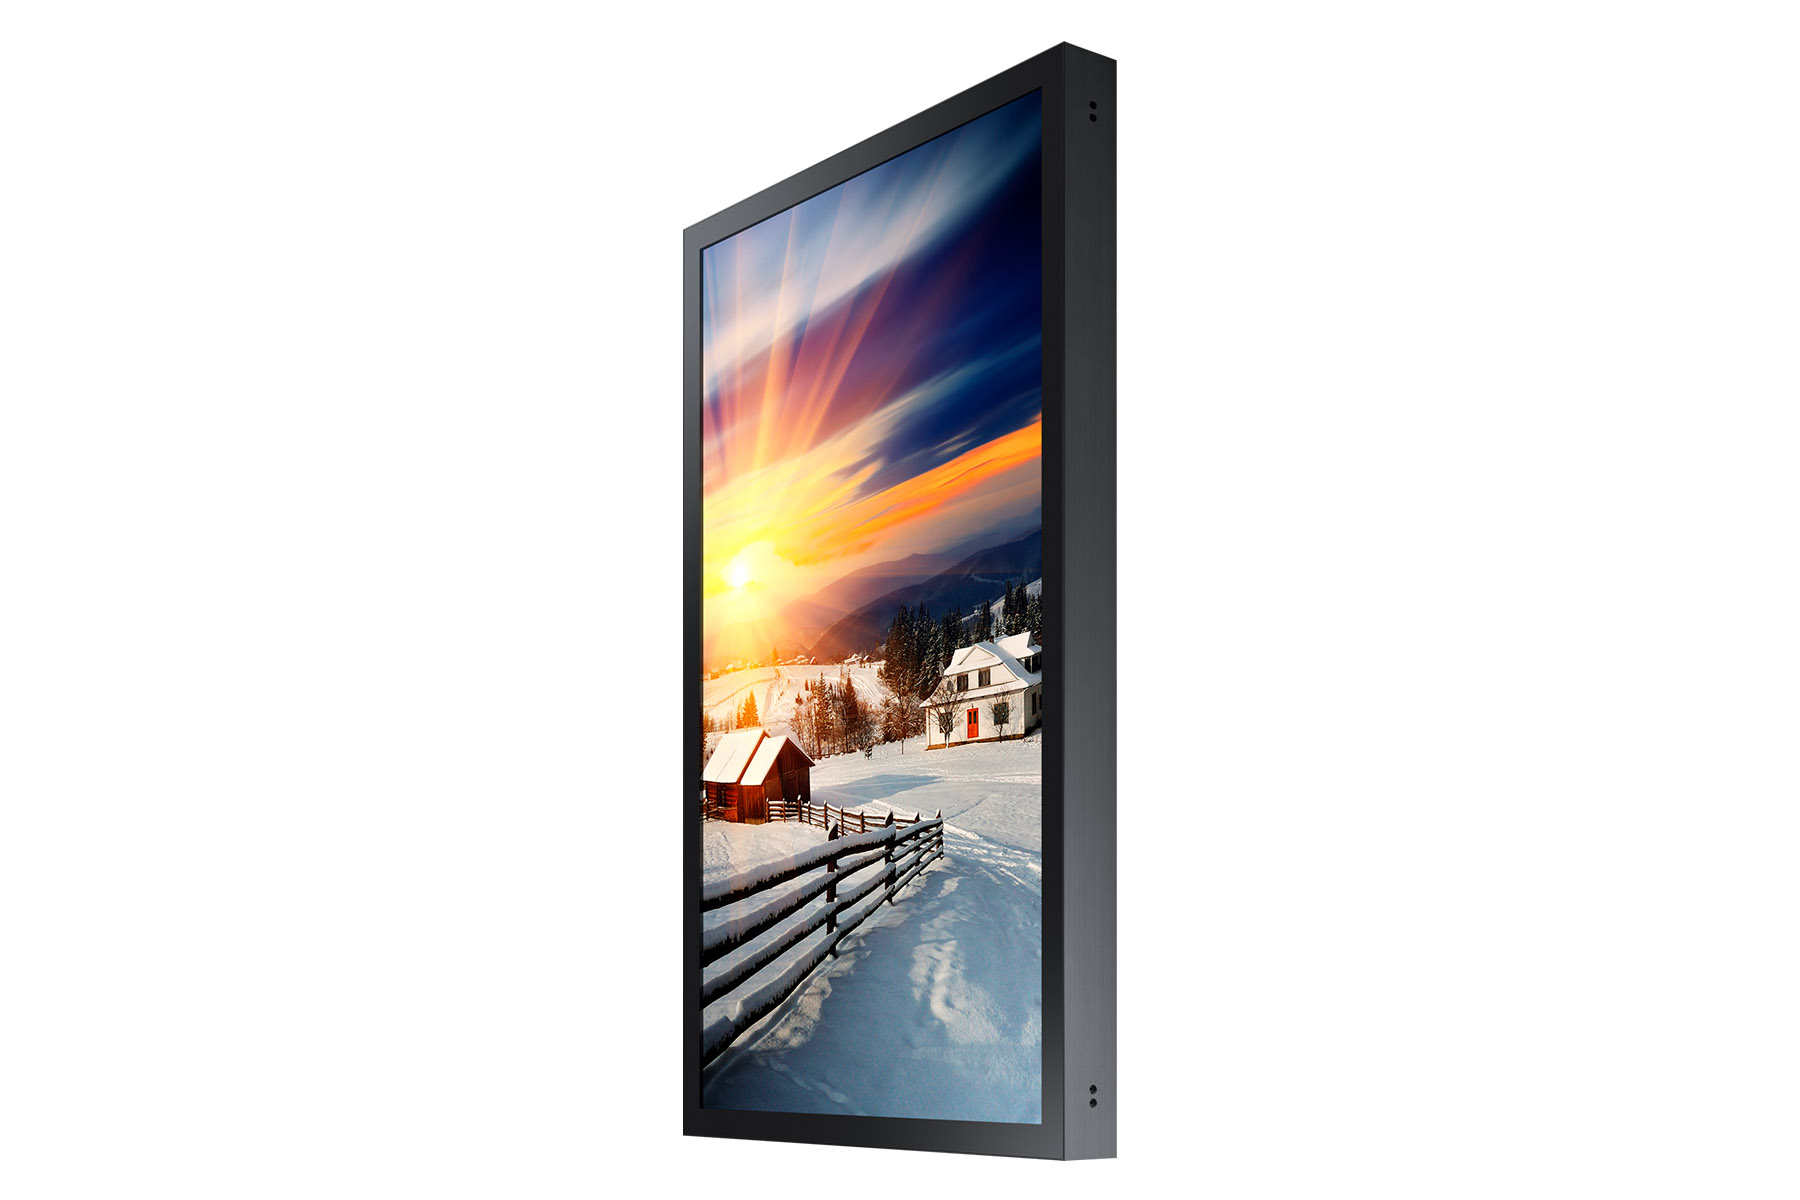 85 zoll lcd outdoordisplay samsung oh85f neuware kaufen bei logando. Black Bedroom Furniture Sets. Home Design Ideas